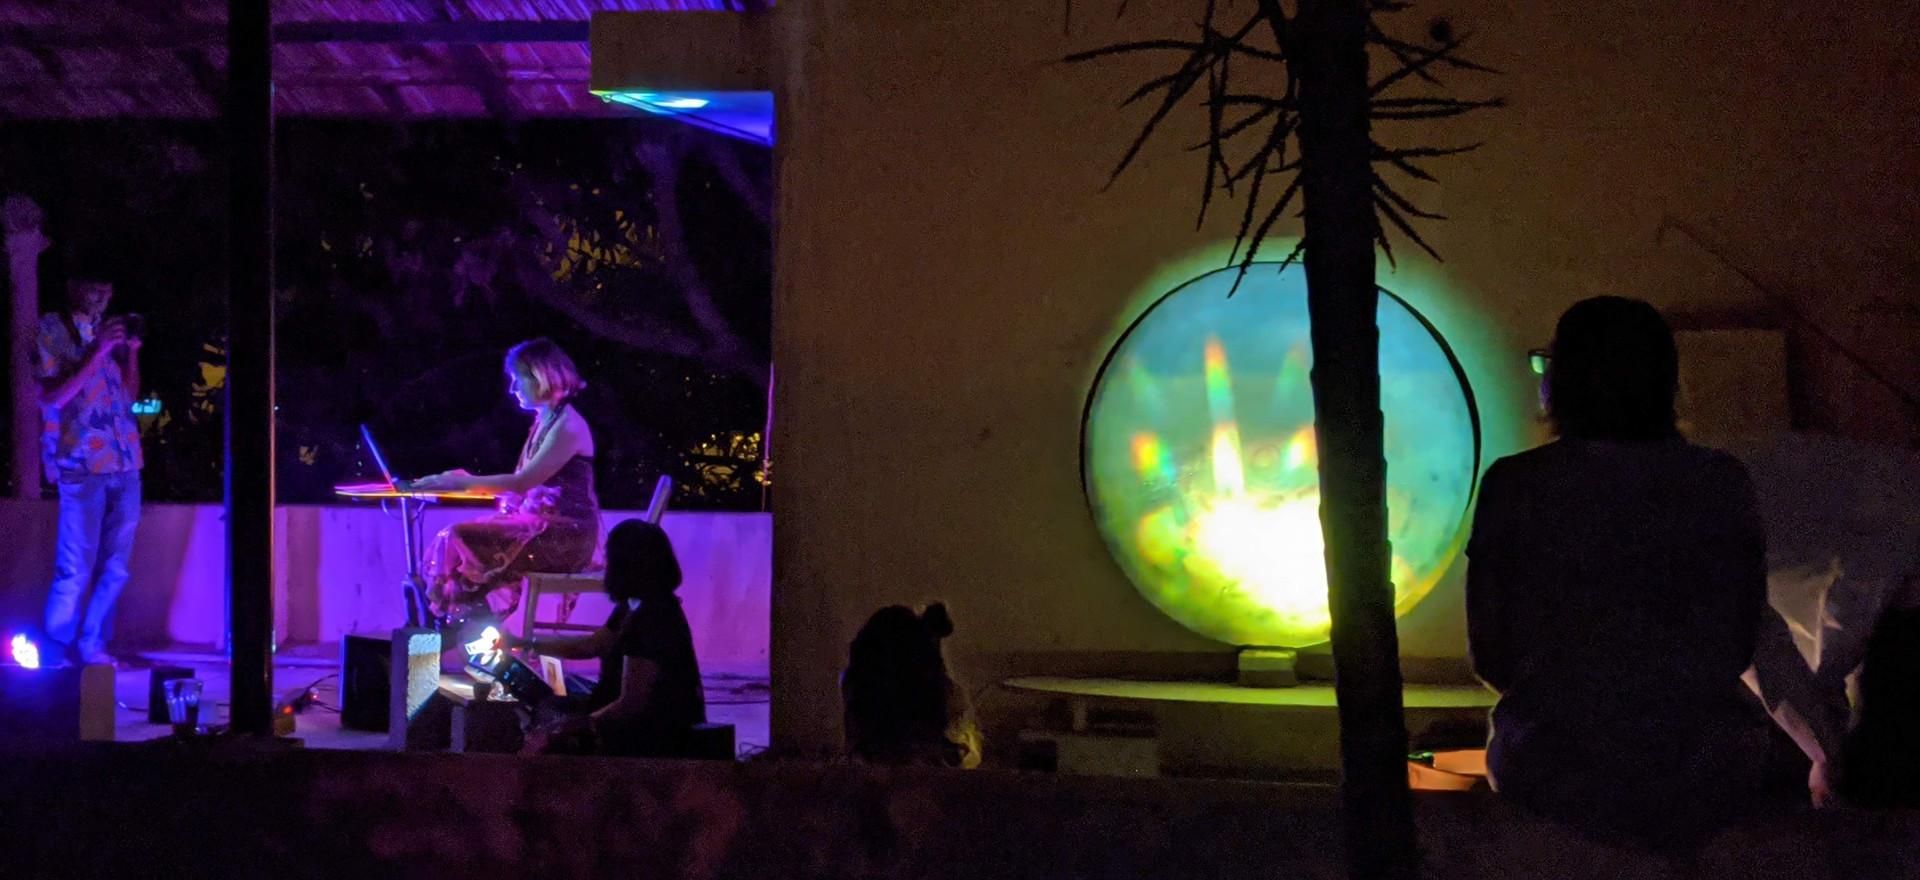 Terrace 2 Performace by Sofy Yuditskaya and Ria Rajan